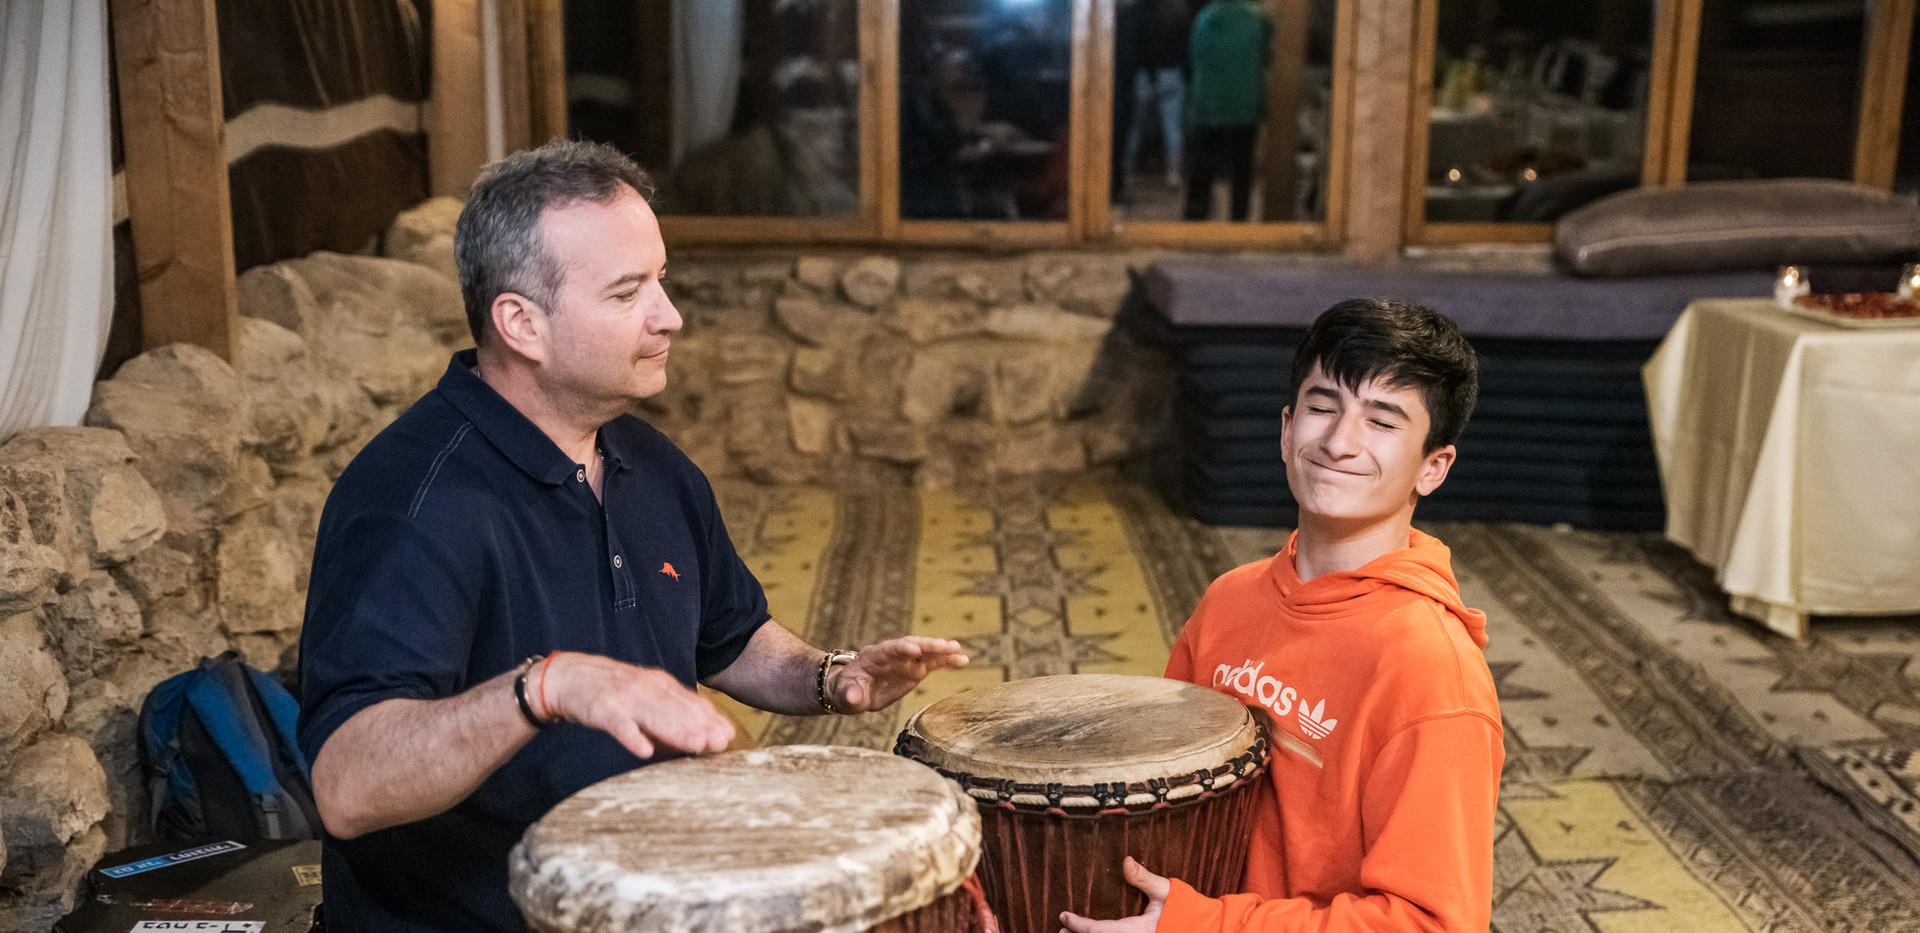 Family jams on Jaman's drums